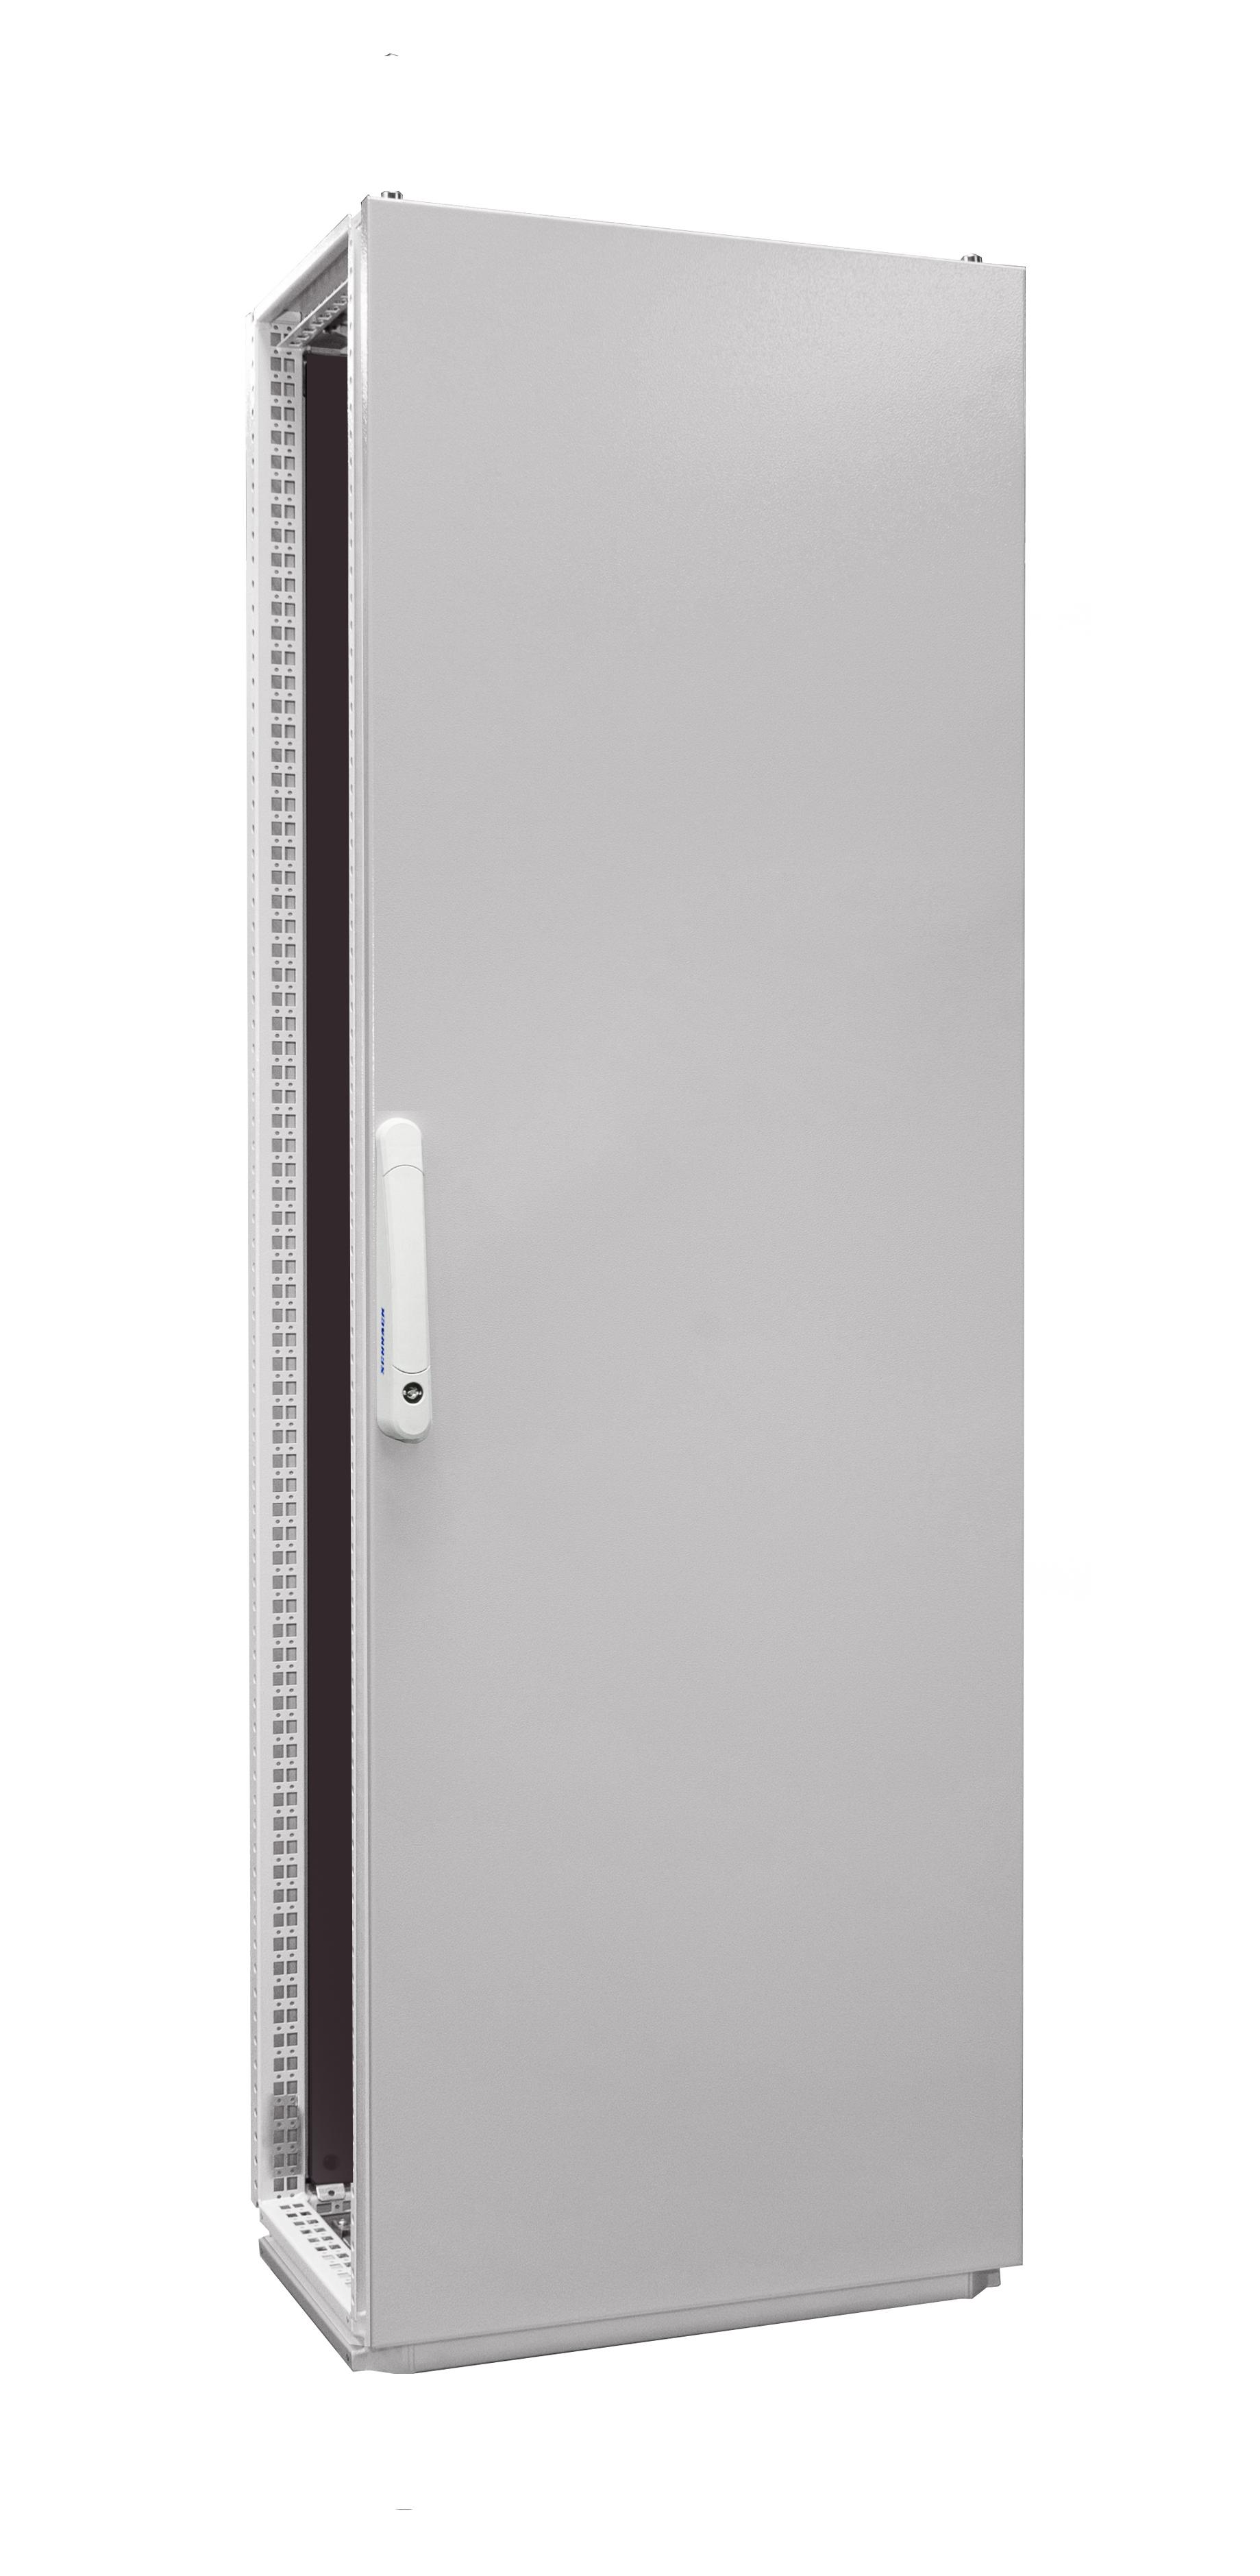 1 Stk Anreihschrank 1-Tür IP55 H=1800 B=600 T=400mm Stahlblech AC186041--